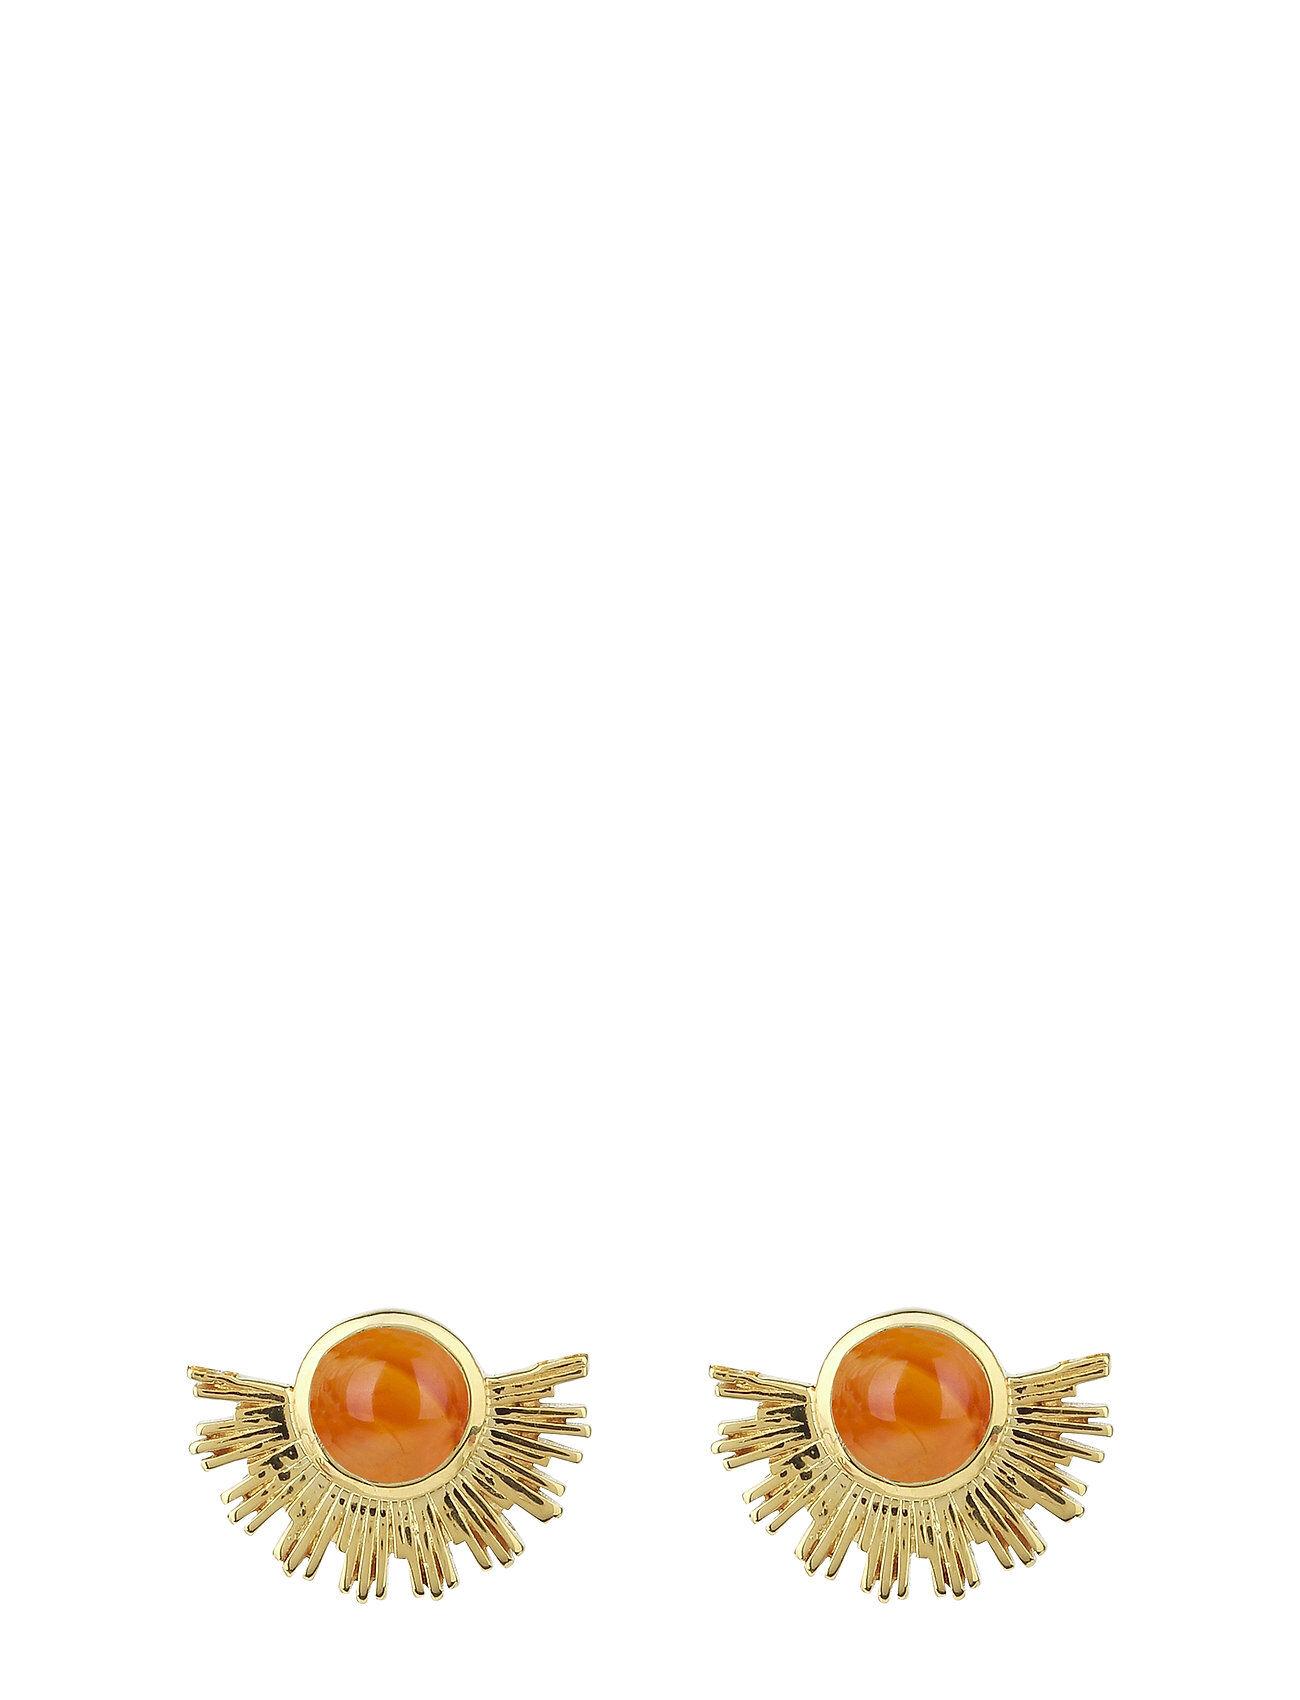 Syster P Sunburst Earrings Gold Accessories Jewellery Earrings Studs Kulta Syster P